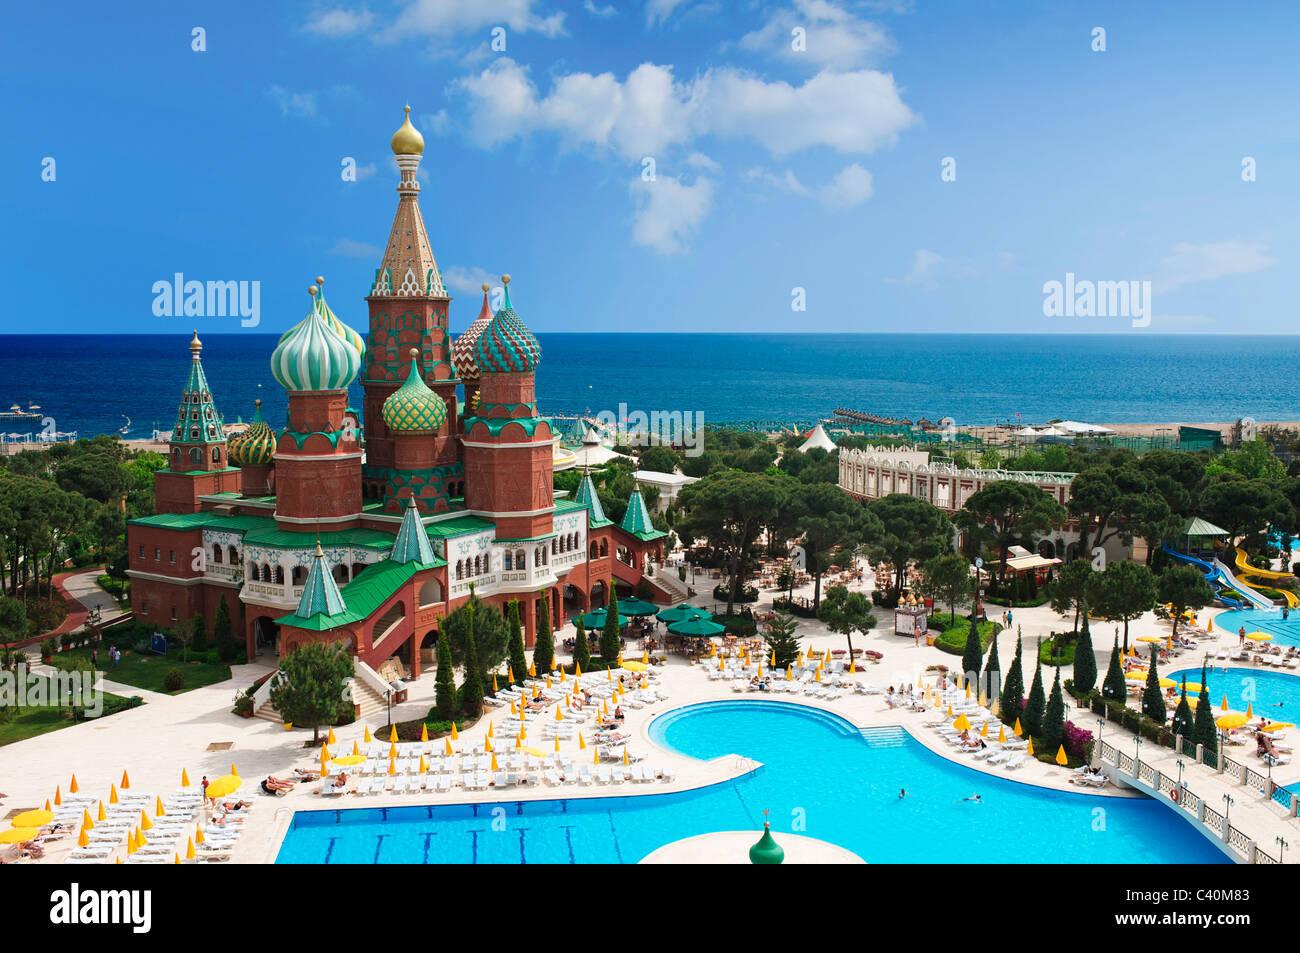 Turkish Riviera Hotel Wow Kremlin Palace Antalya Turkish Stock